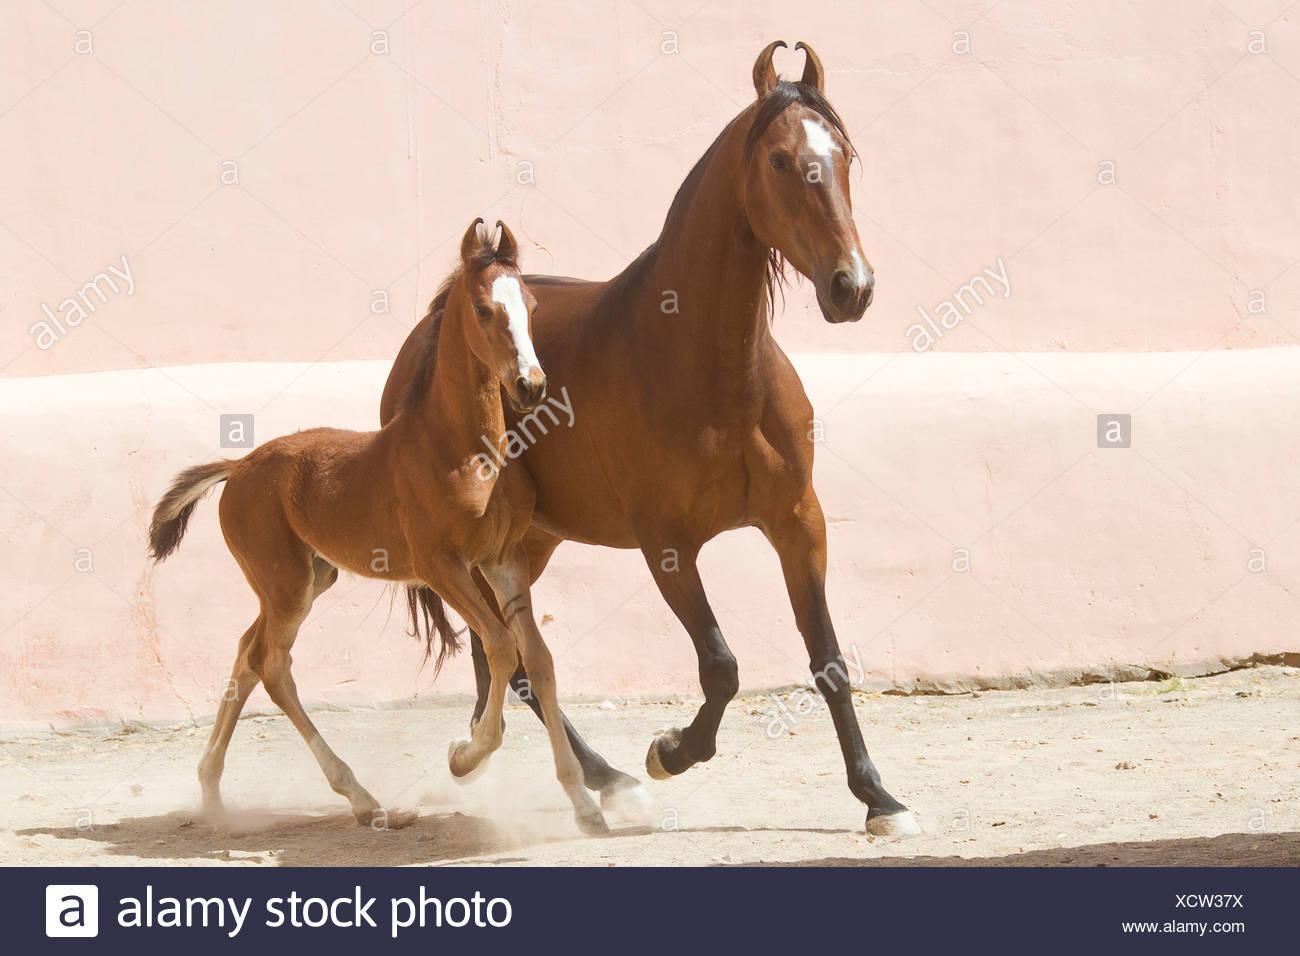 Horse Marwari foal pictures photo